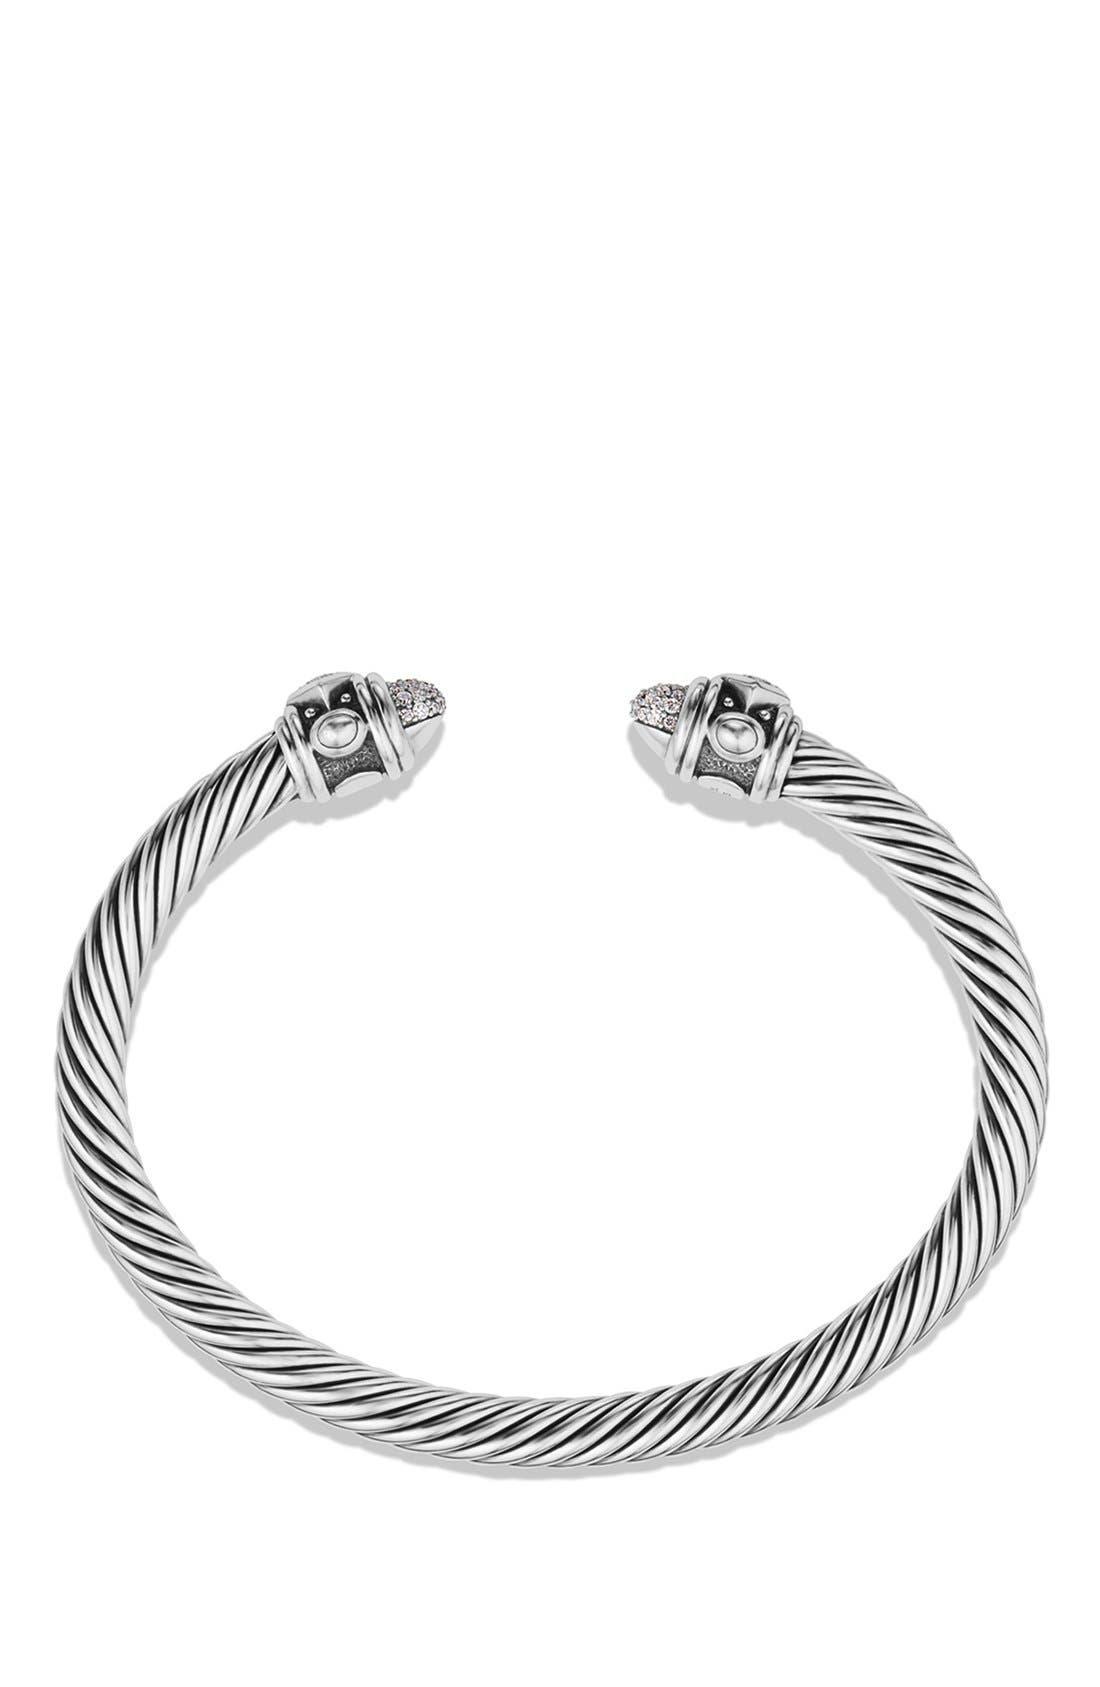 Renaissance Bracelet with Diamonds in Silver, 5mm,                             Alternate thumbnail 2, color,                             DIAMOND